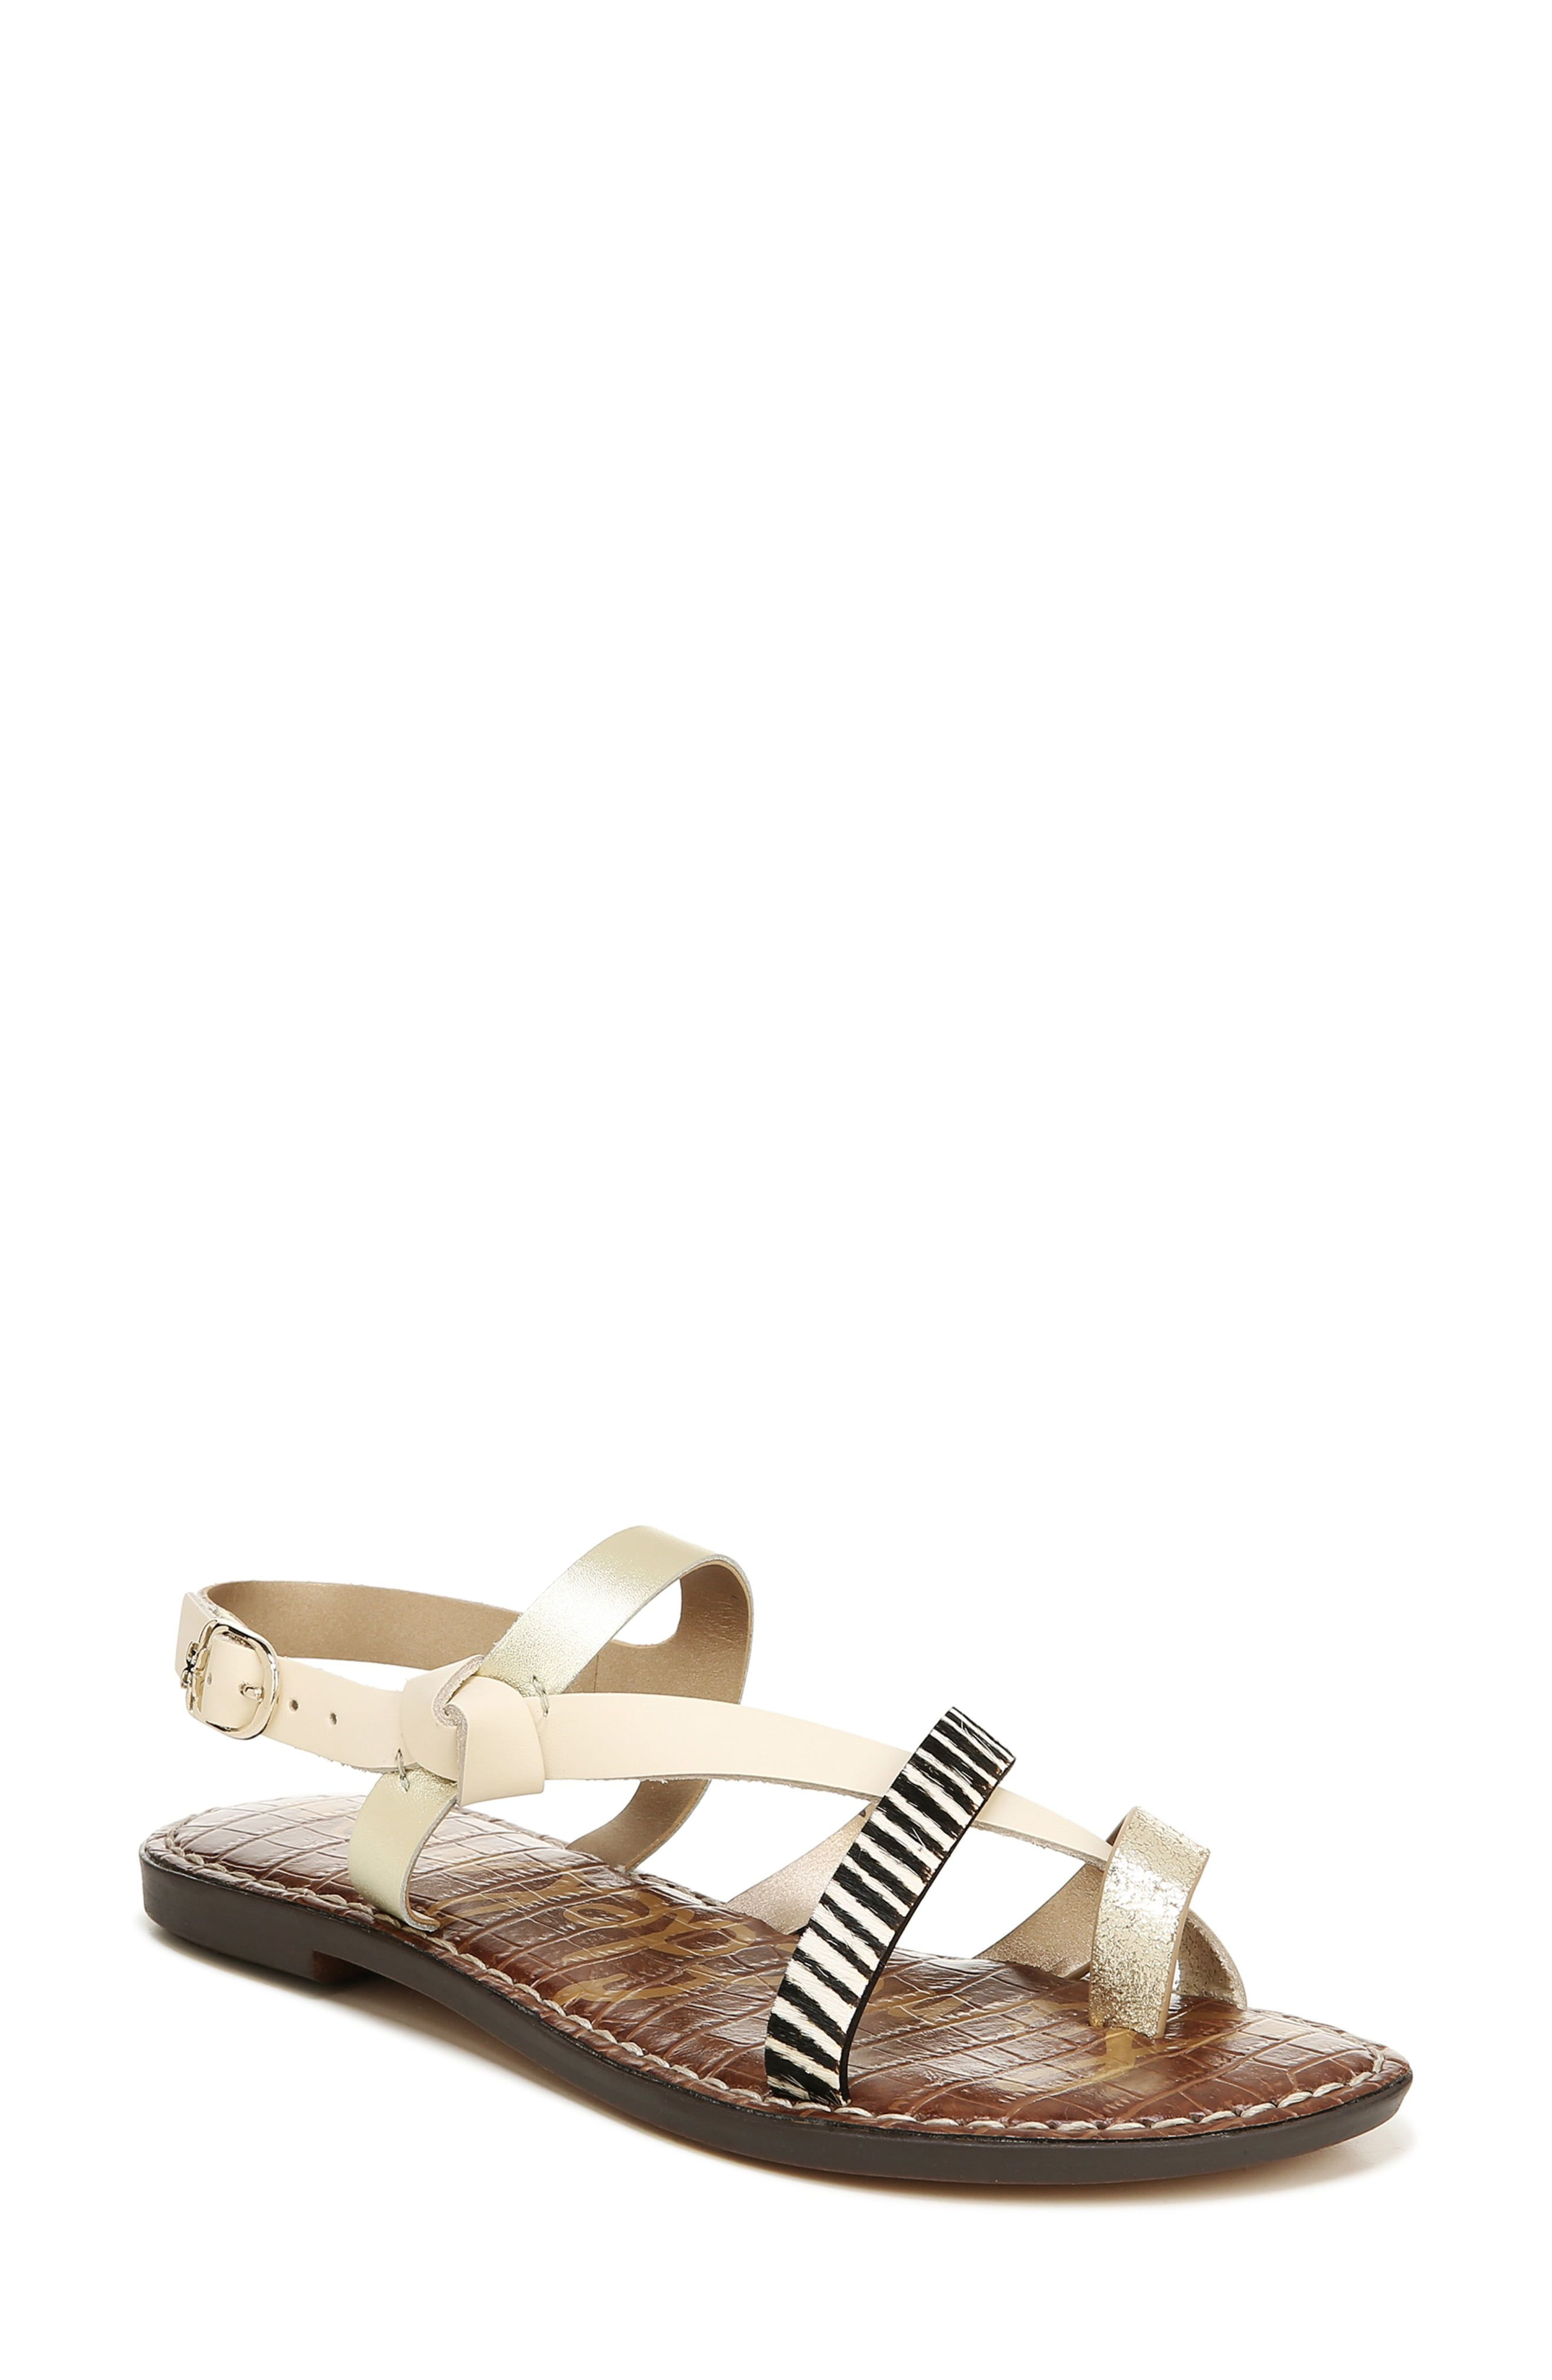 Sam Edelman Gladis Strappy Sandal (Women | Toe loop sandals